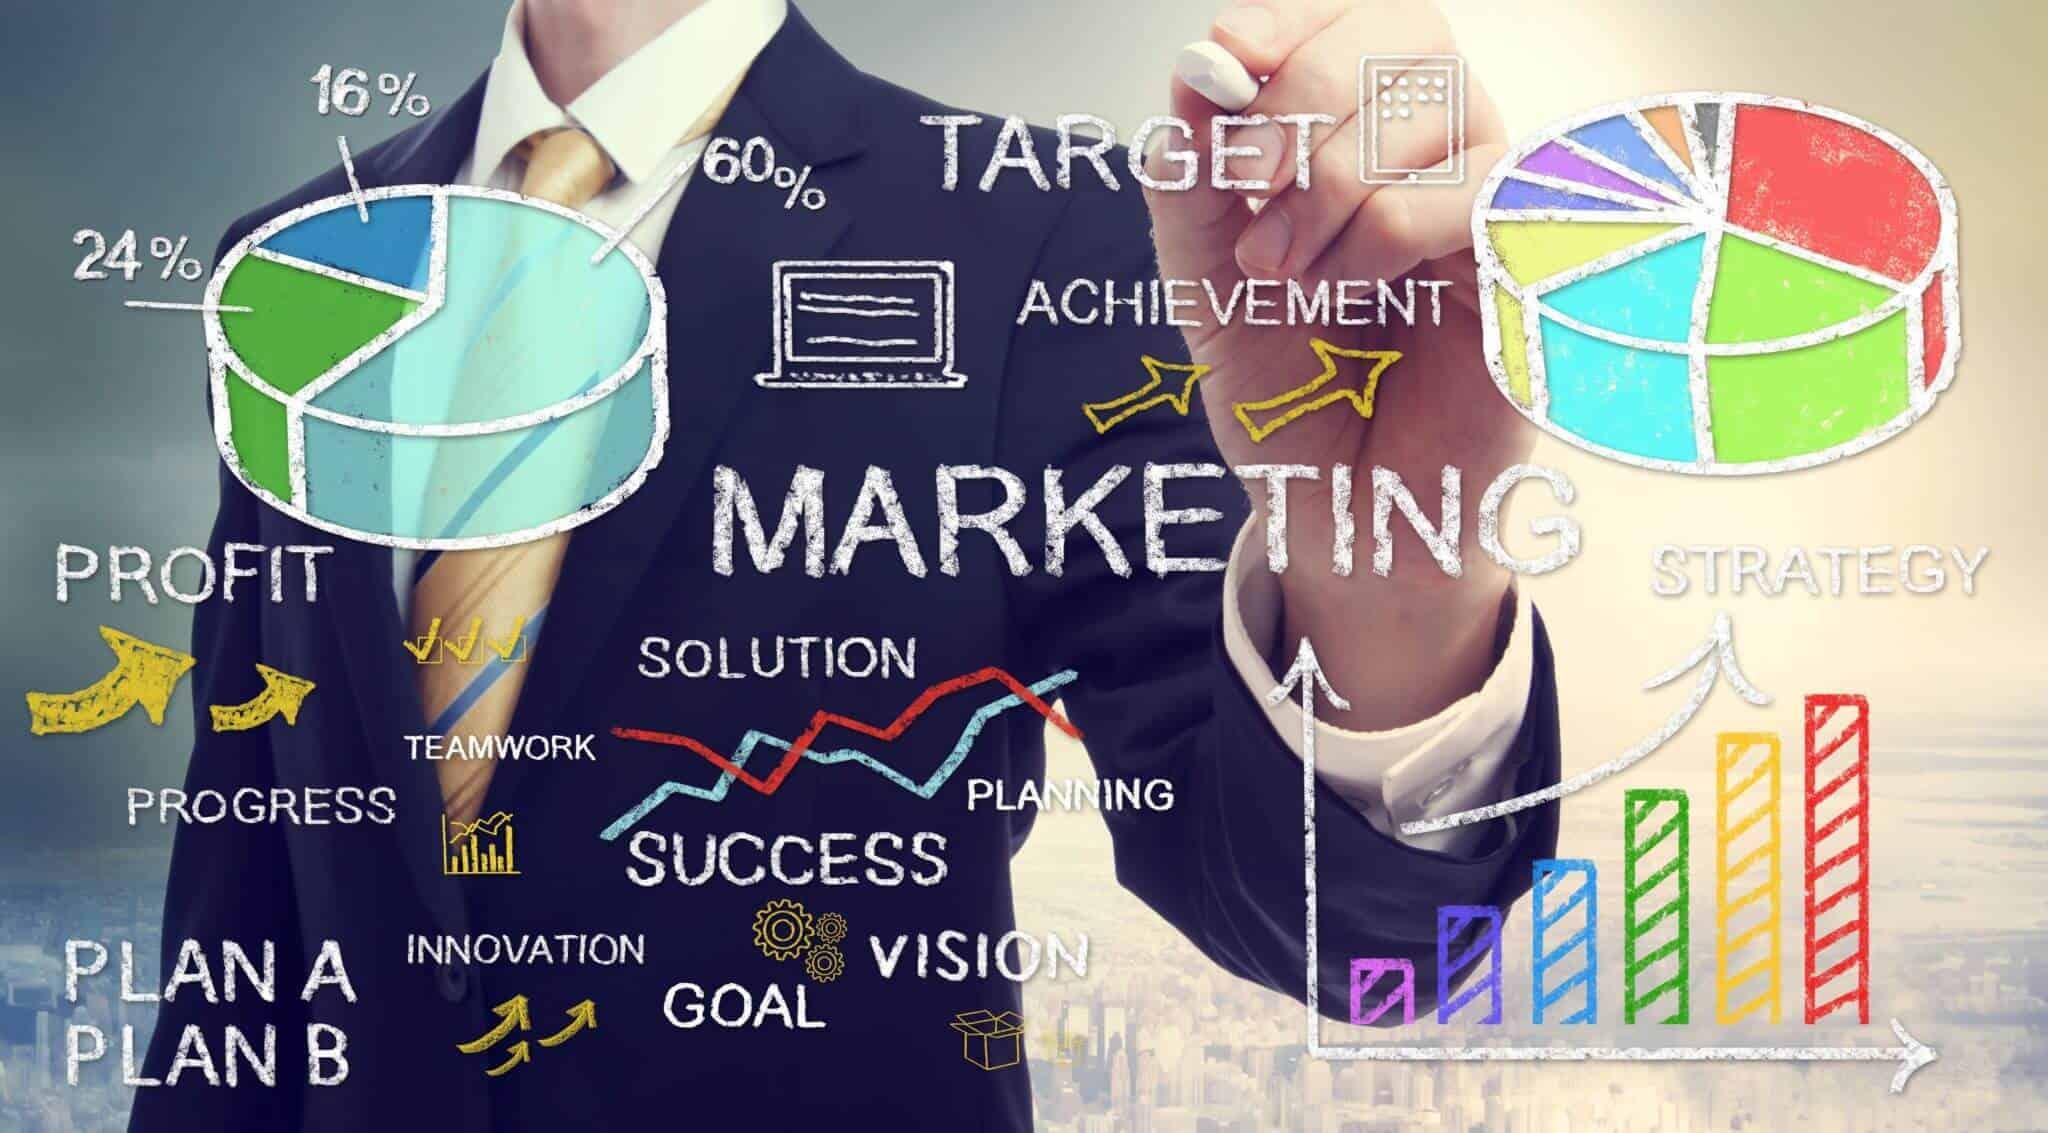 Inbound Marketing with Social Media